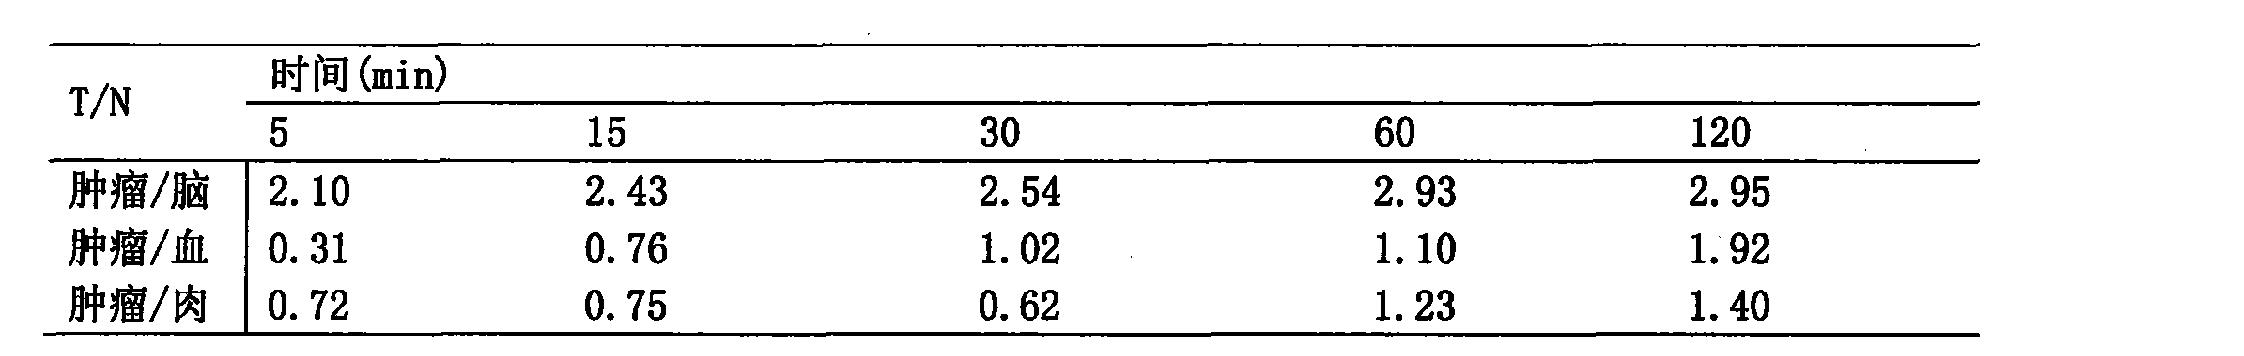 CN101723849B - Novel 18F labeled amino acid derivatives, preparation method and application